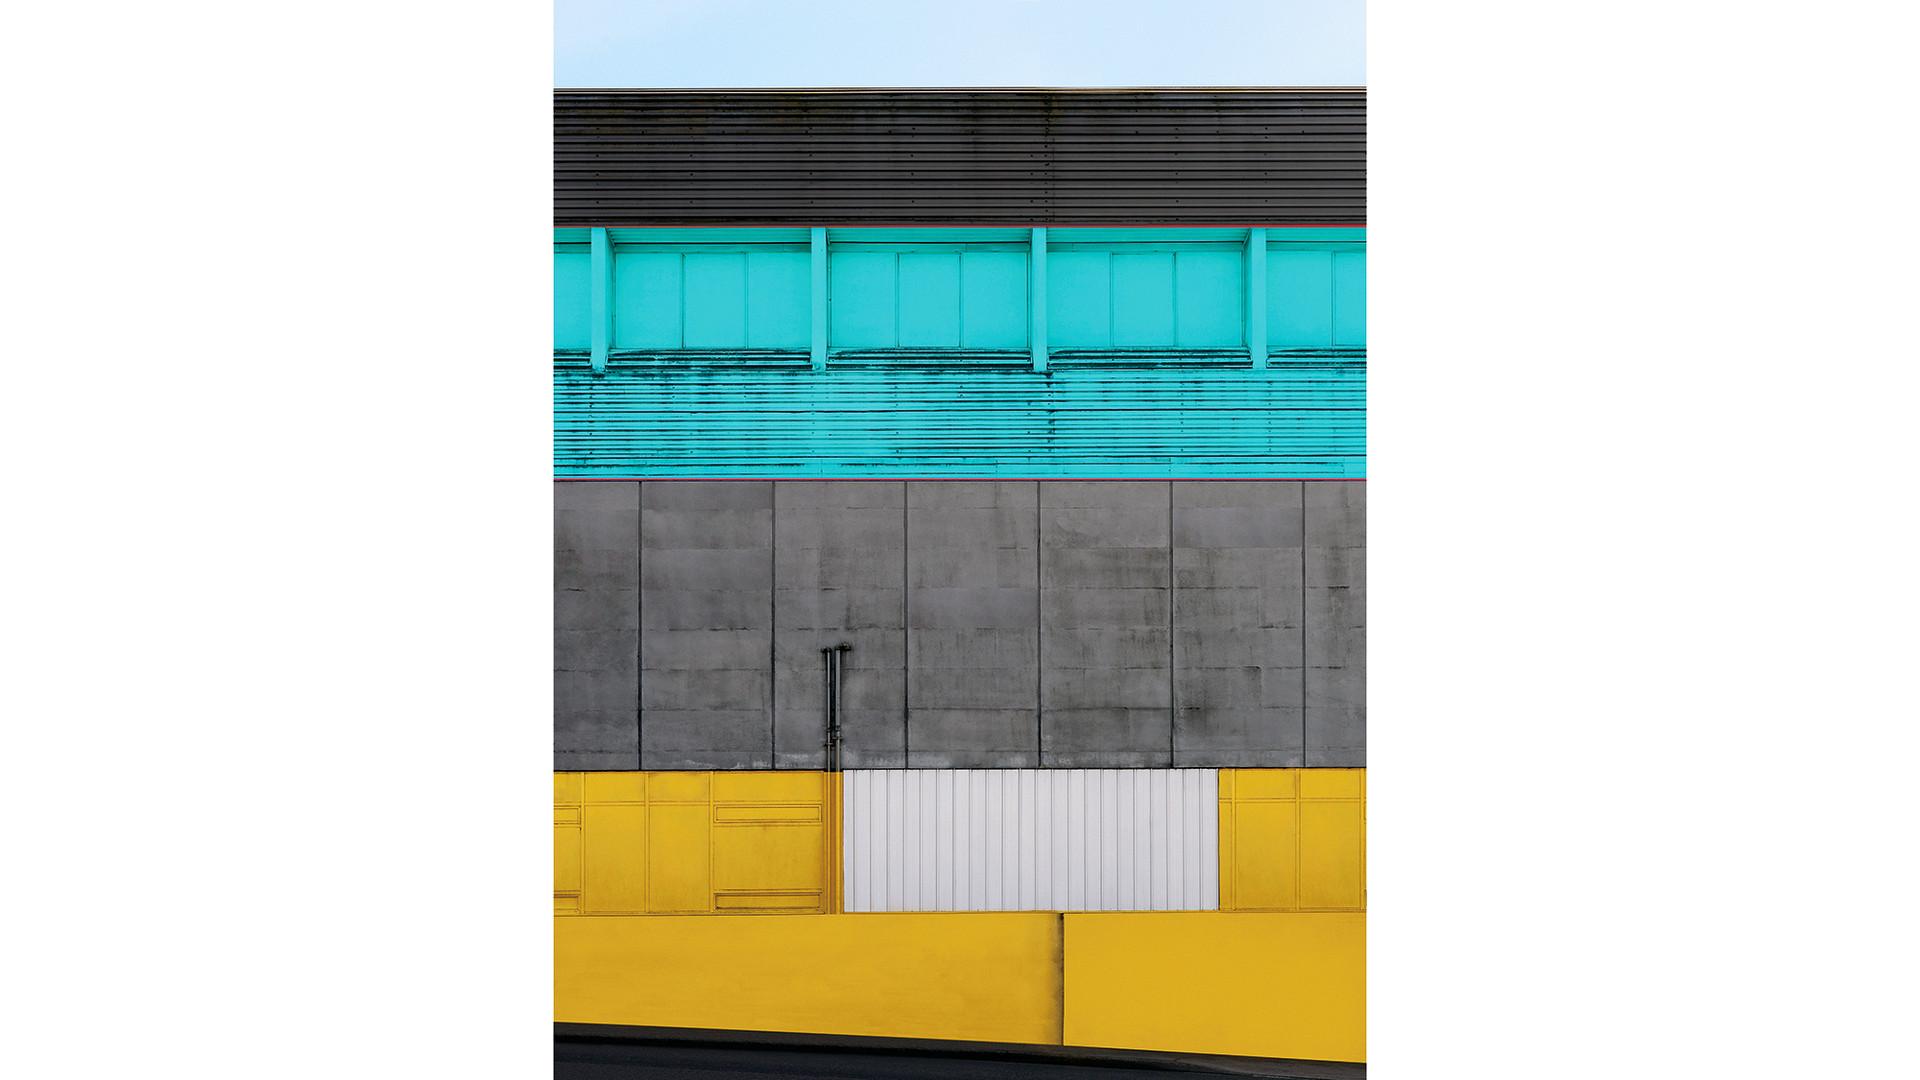 Olive Way I, 2017 130x100cm, archival pigment print, ed. of 10